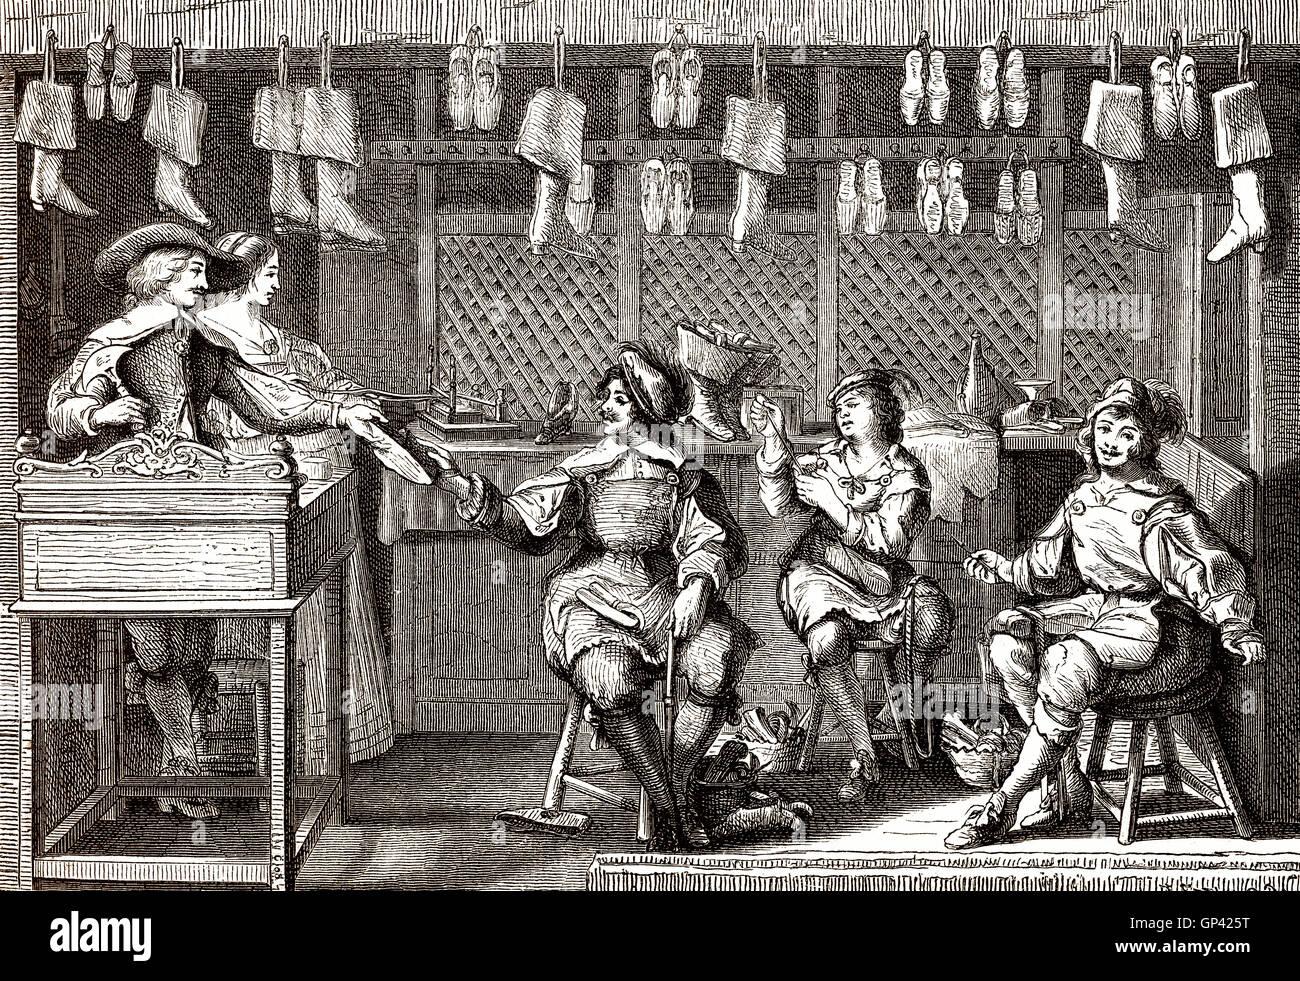 Shoe store, 17th century - Stock Image